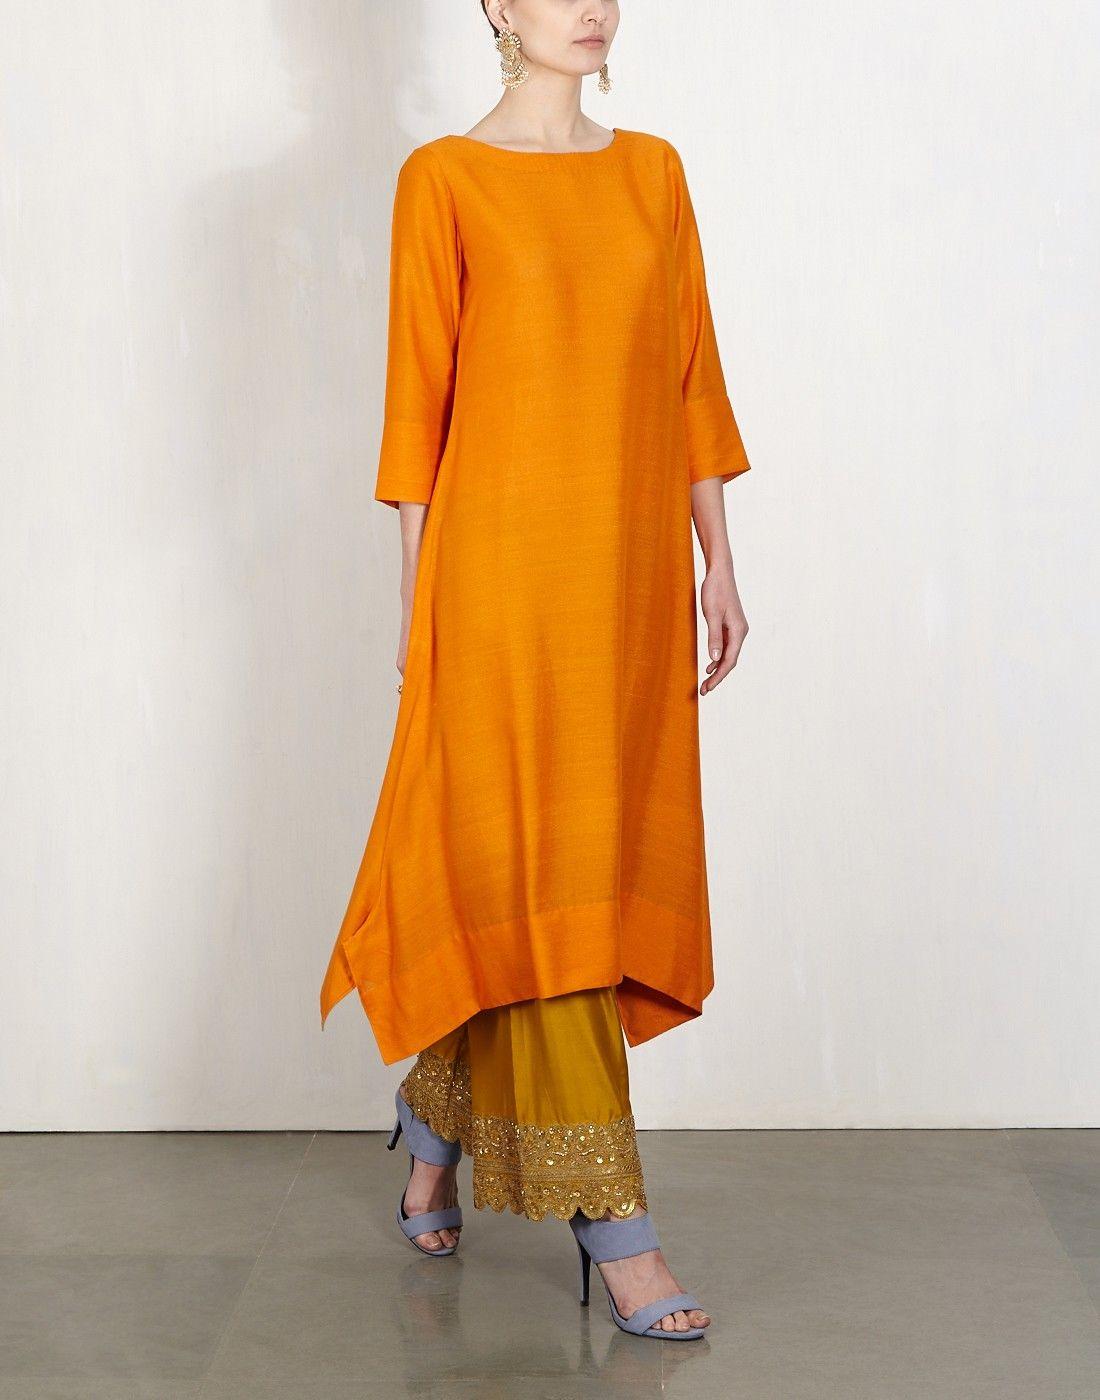 Orange Kurta With Embroidered Pants-Lajjoo C- img2